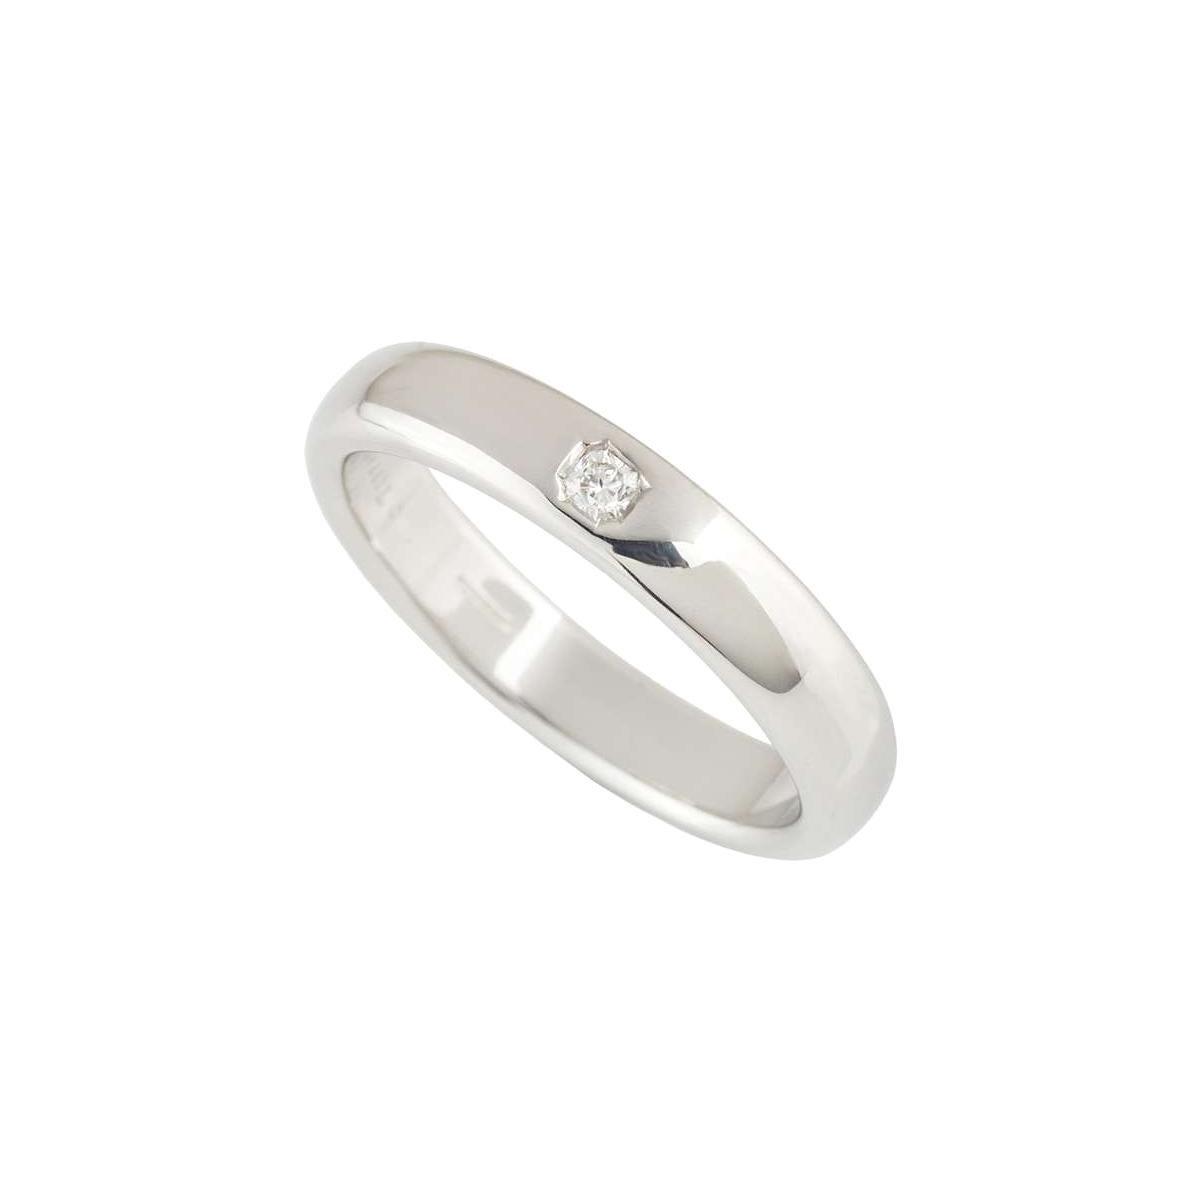 Tiffany & Co. Lucida Diamond Wedding Band in Platinum